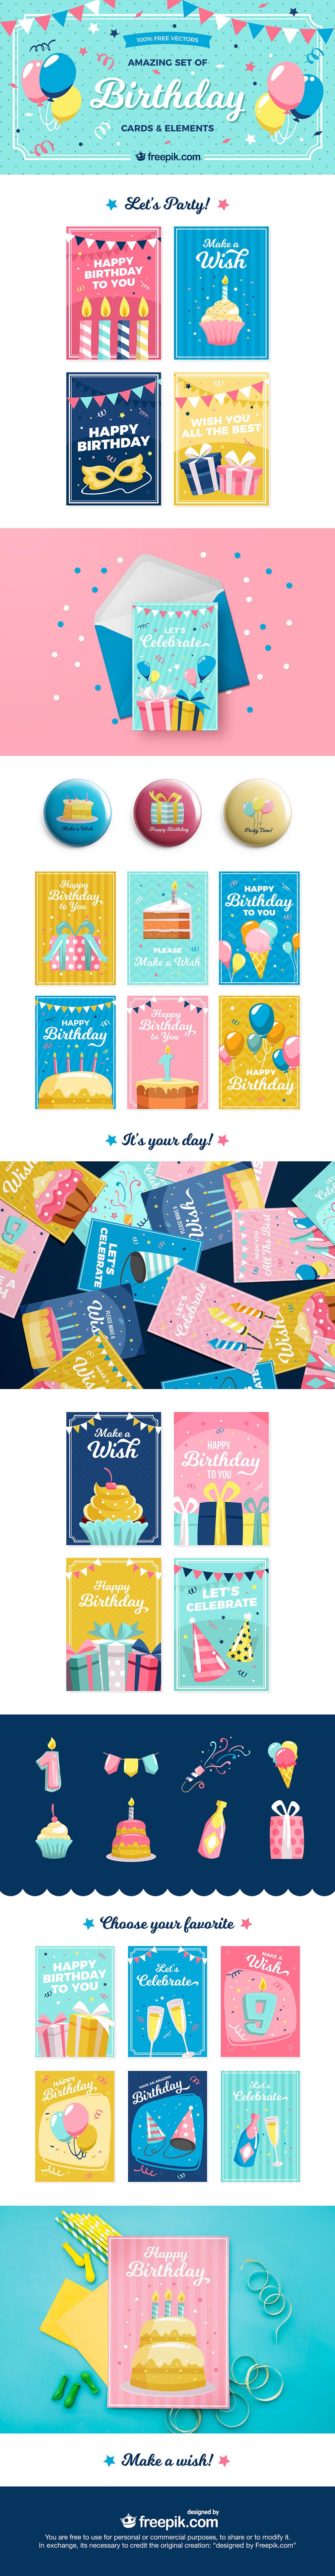 Amazing Set of Birthday Cards & Elements